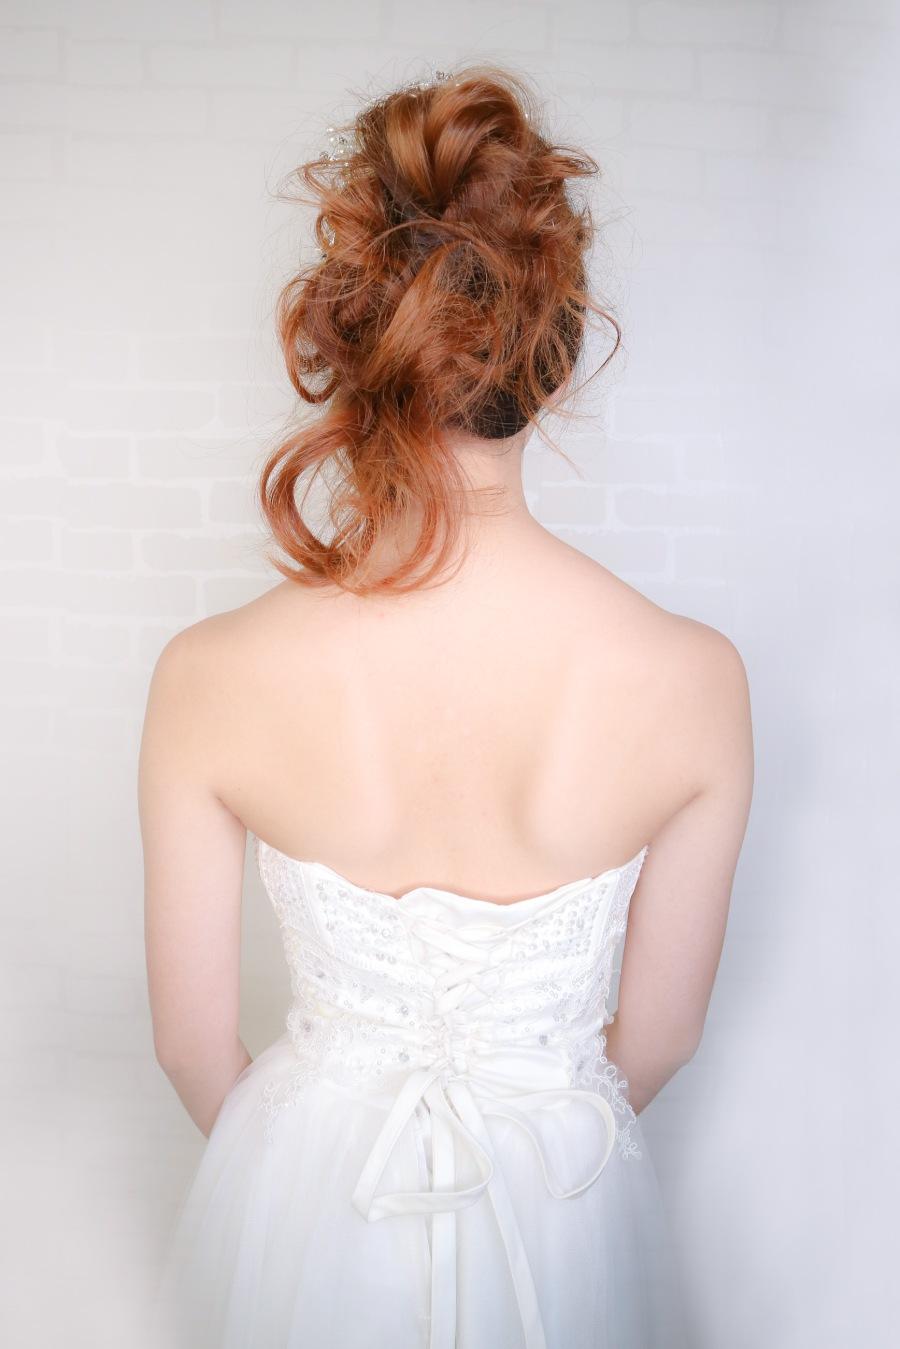 coolstylist韓式新娘化妝髮型攝影服務_bridal_wedding_Korea_makeup_hairstyling_Top_MUA_paulstylist_photography_hk_model_Liya-4